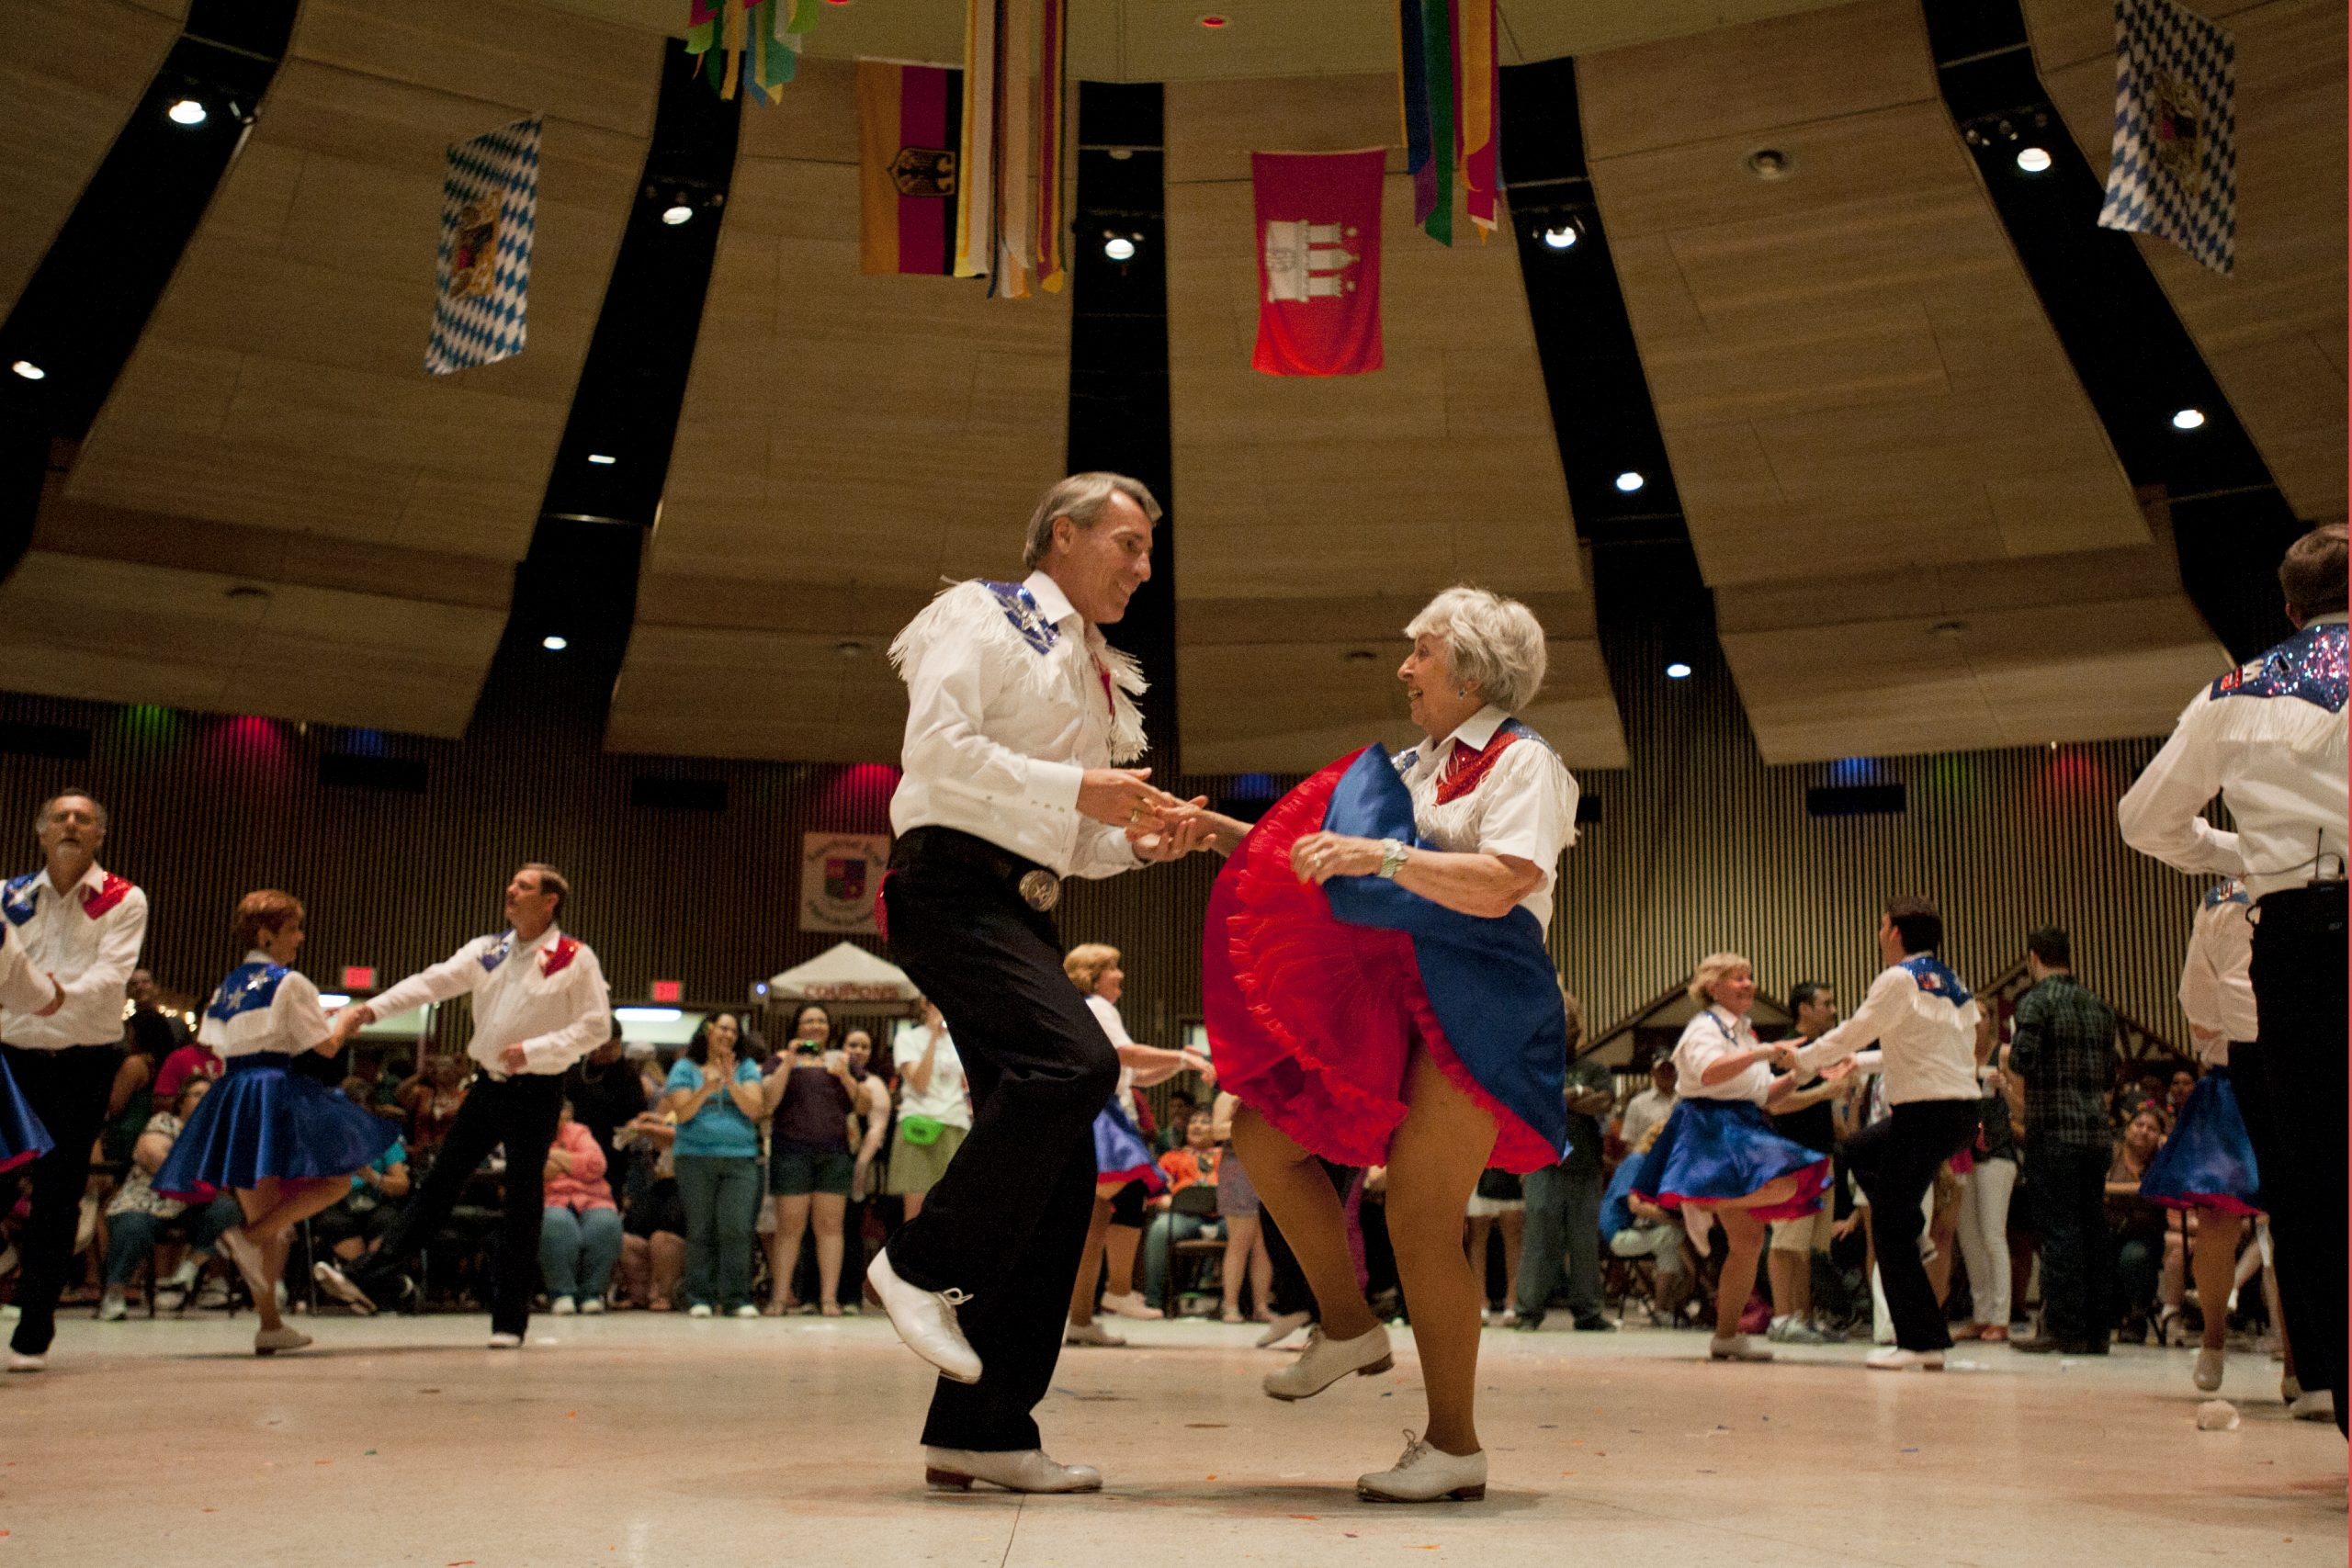 A cultural dance during the NIOSA festivities. Photo by Corey Leamon.